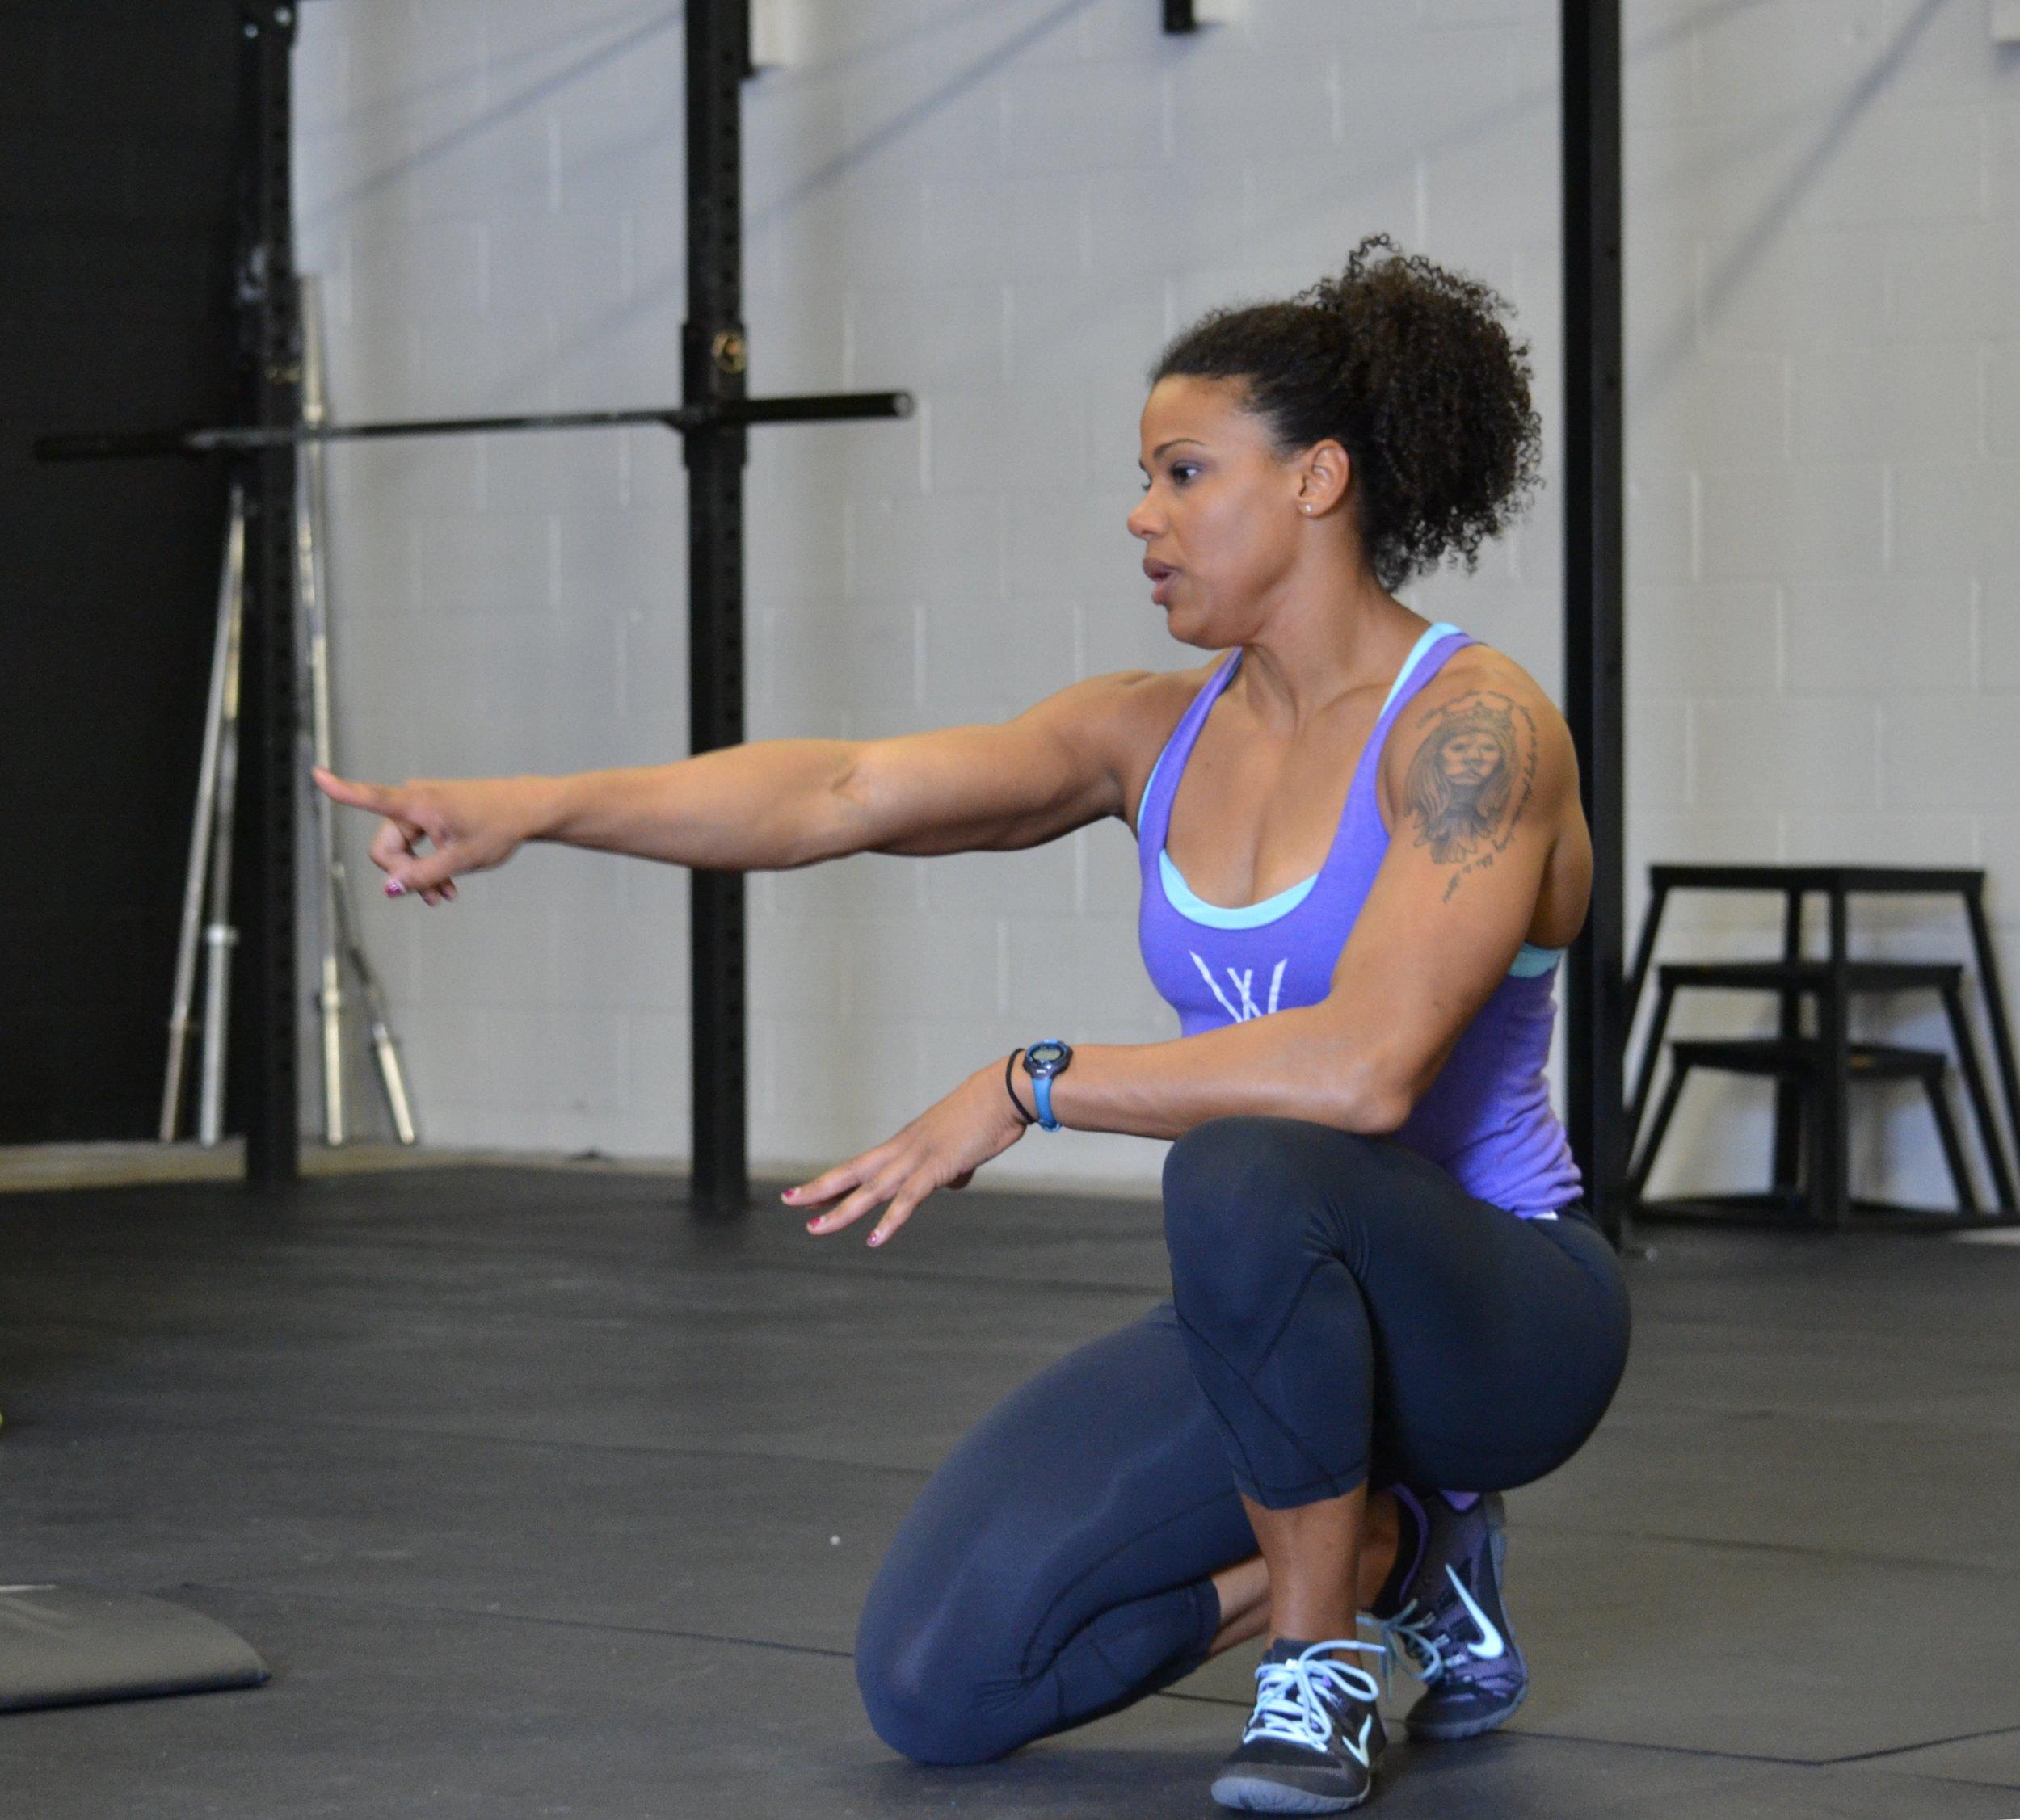 weightlifting series: clean & jerk - click to register